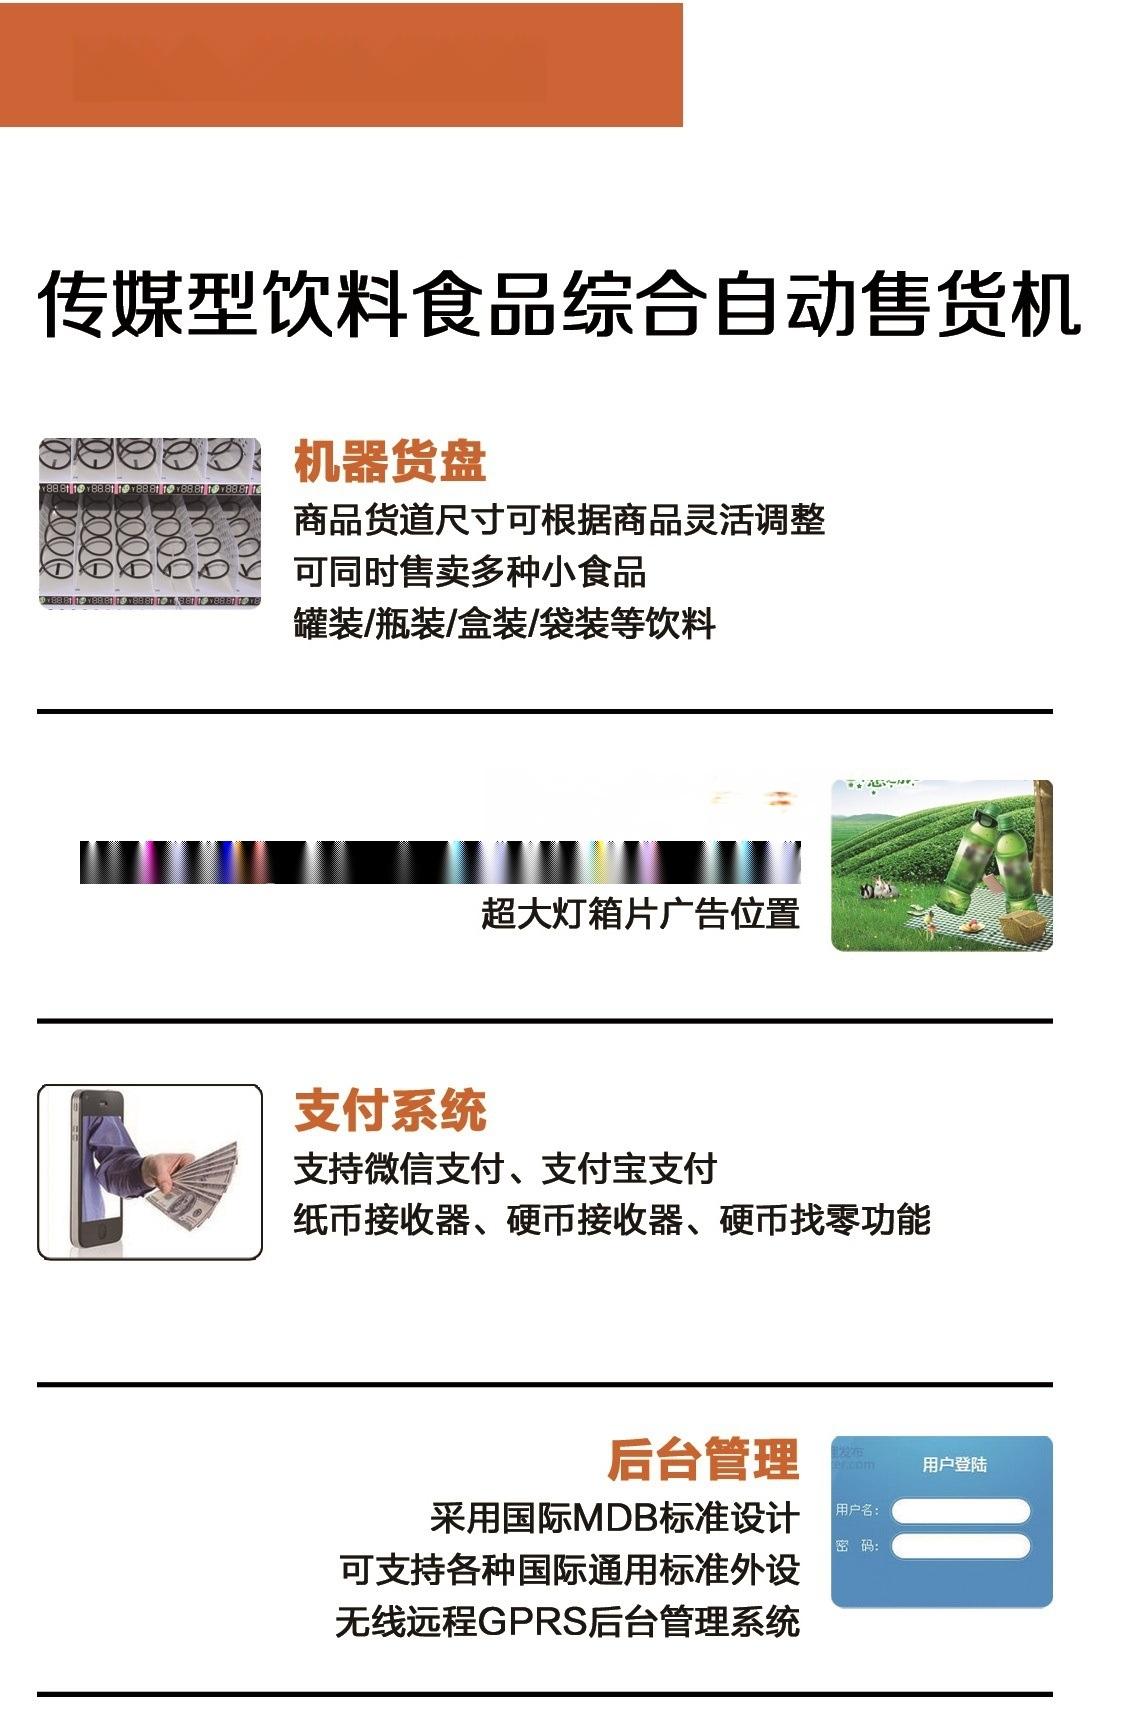 LV-XO2 - 功能簡介